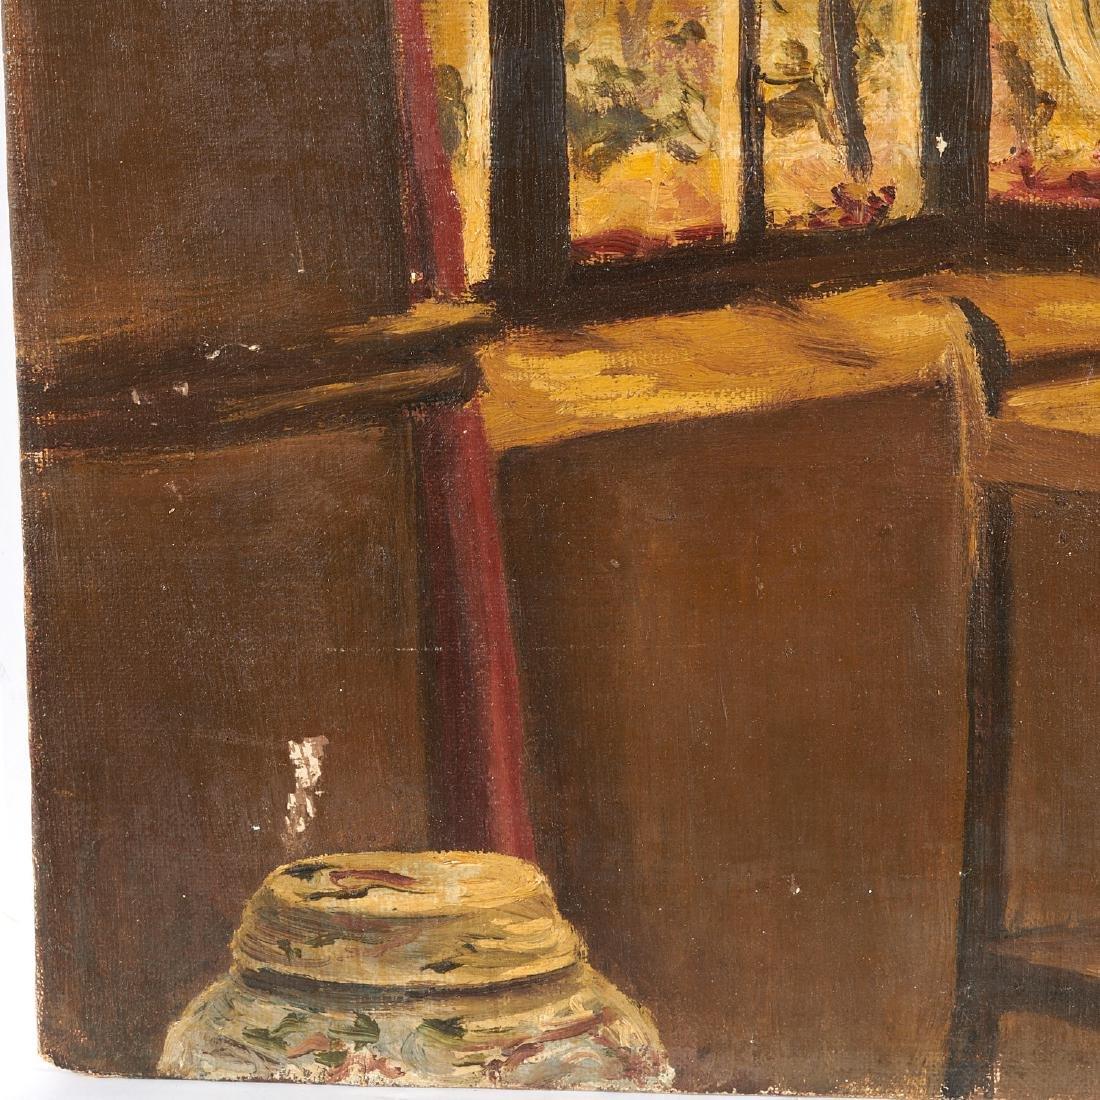 Fulco De Verdure, Still Life by Window, c. 1930s - 4